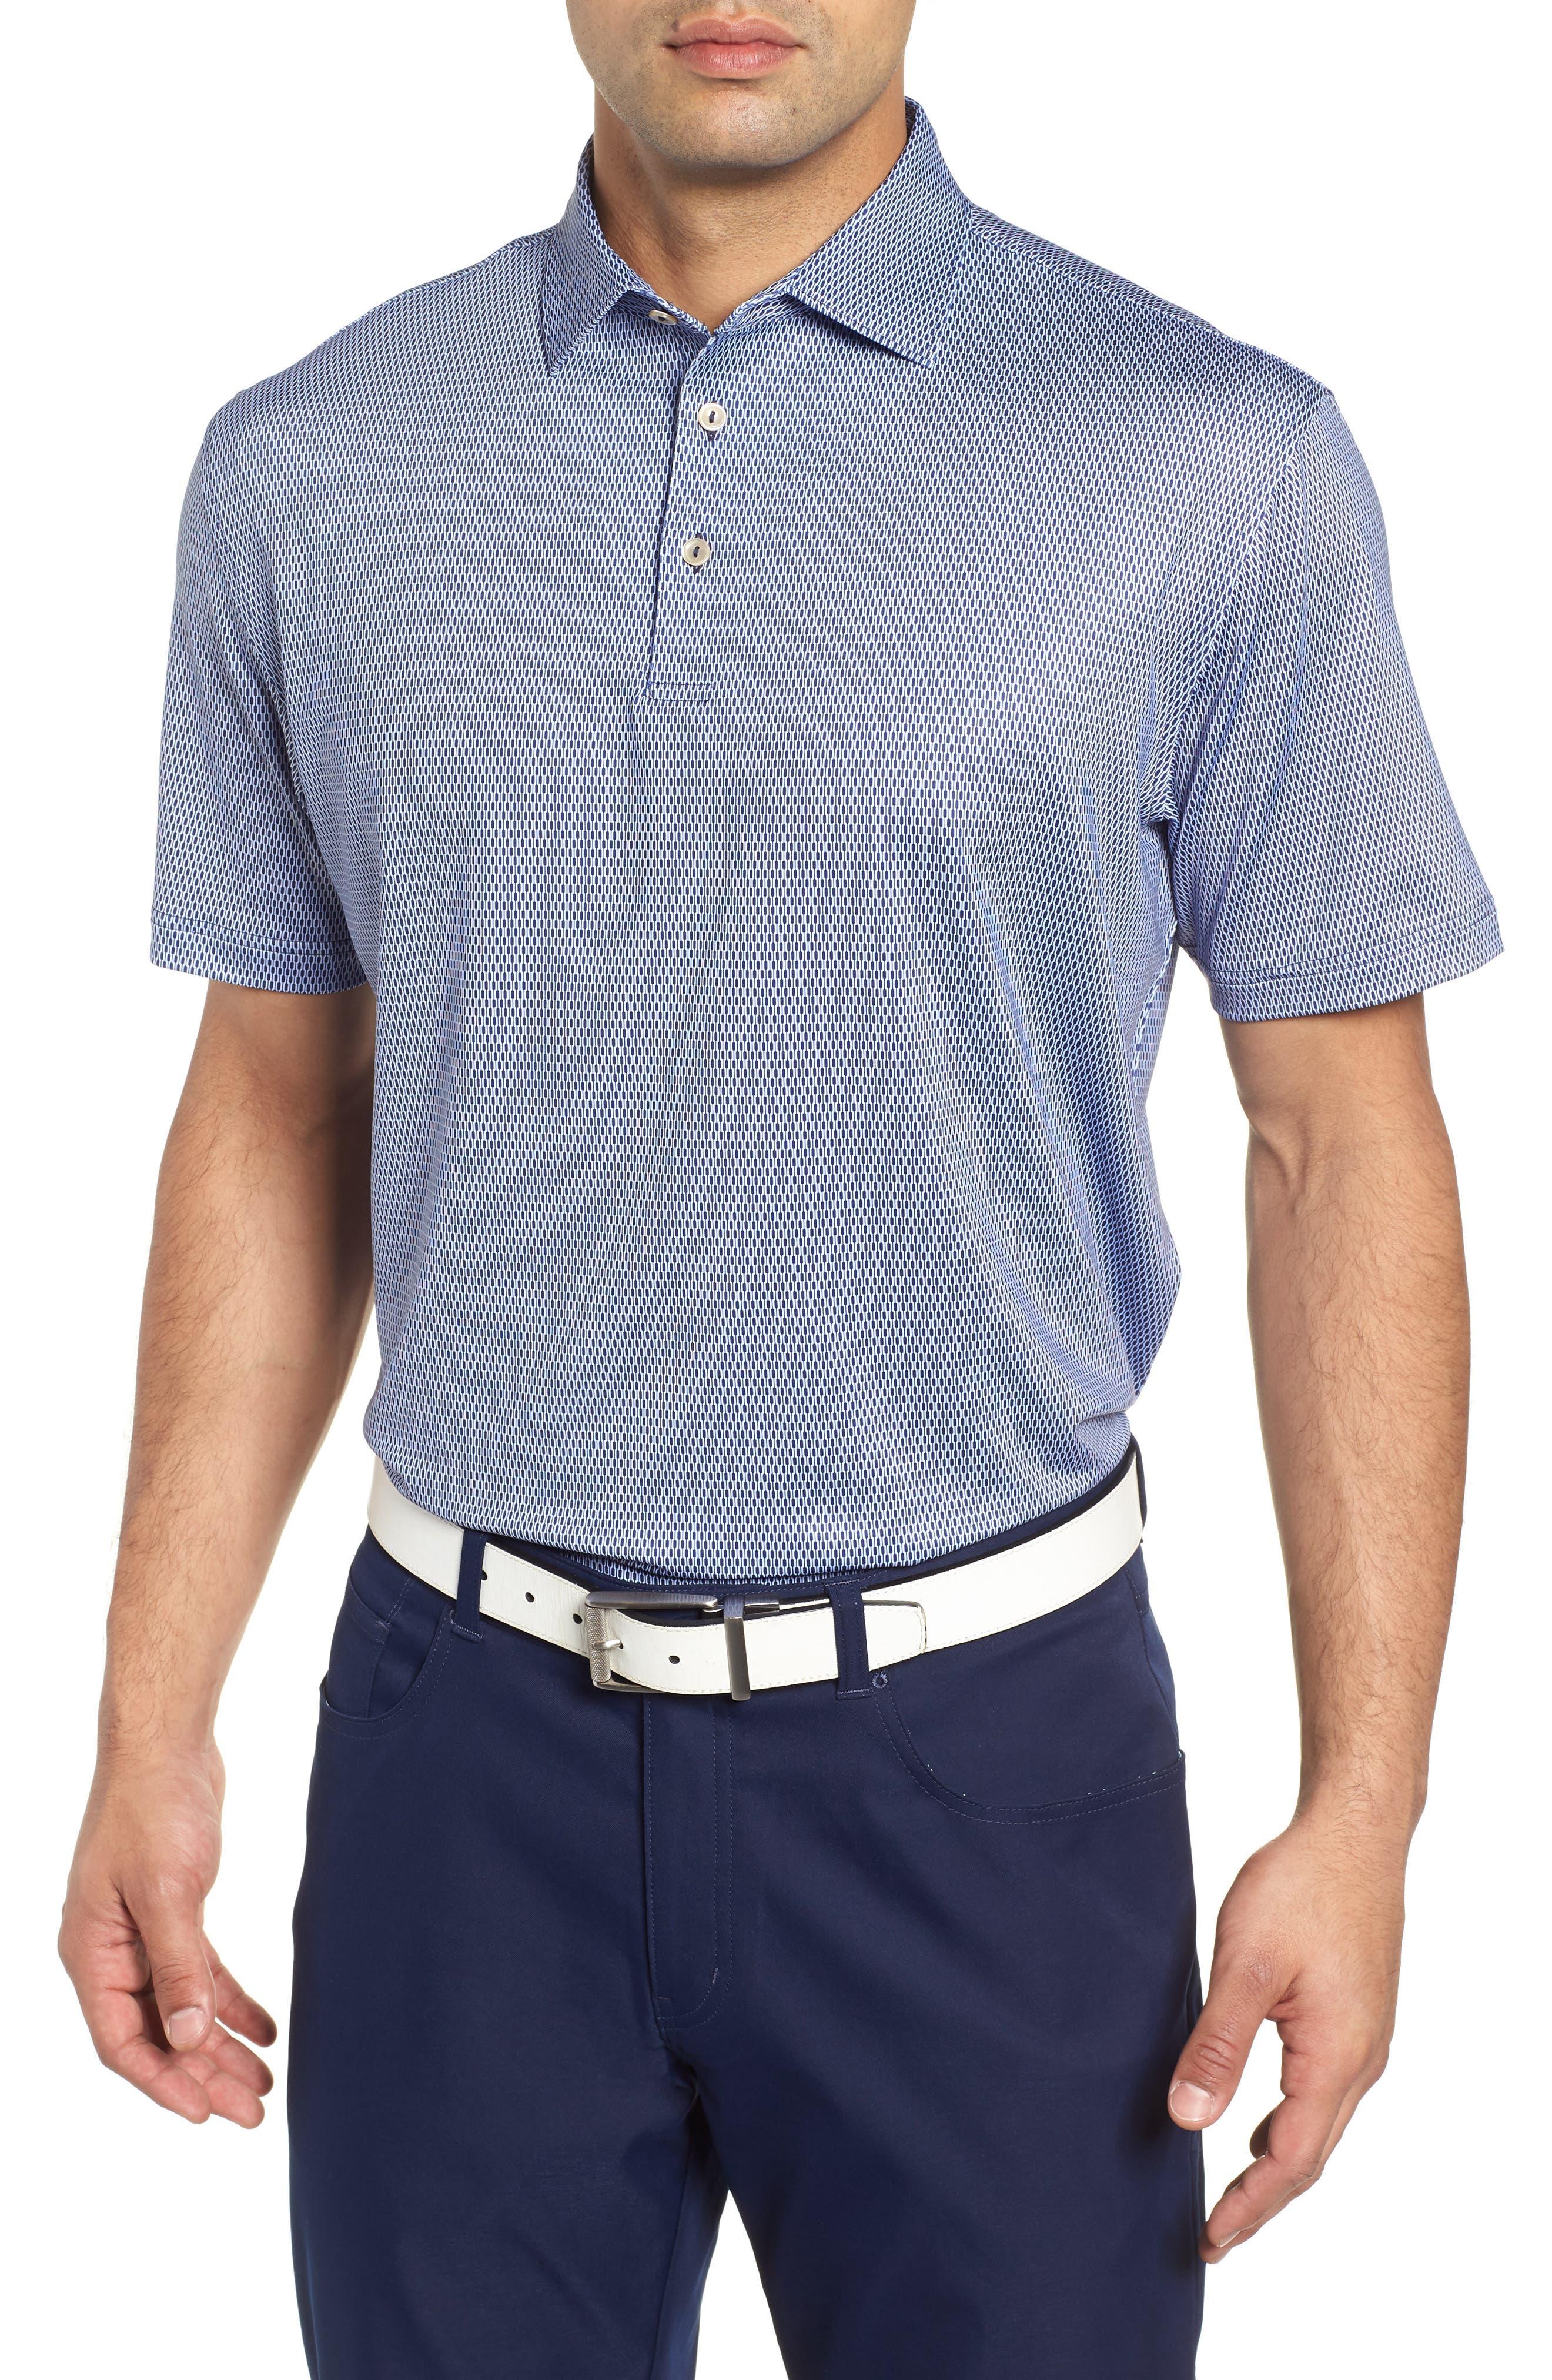 Latimer Classic Fit Links Print Golf Polo,                             Main thumbnail 1, color,                             410